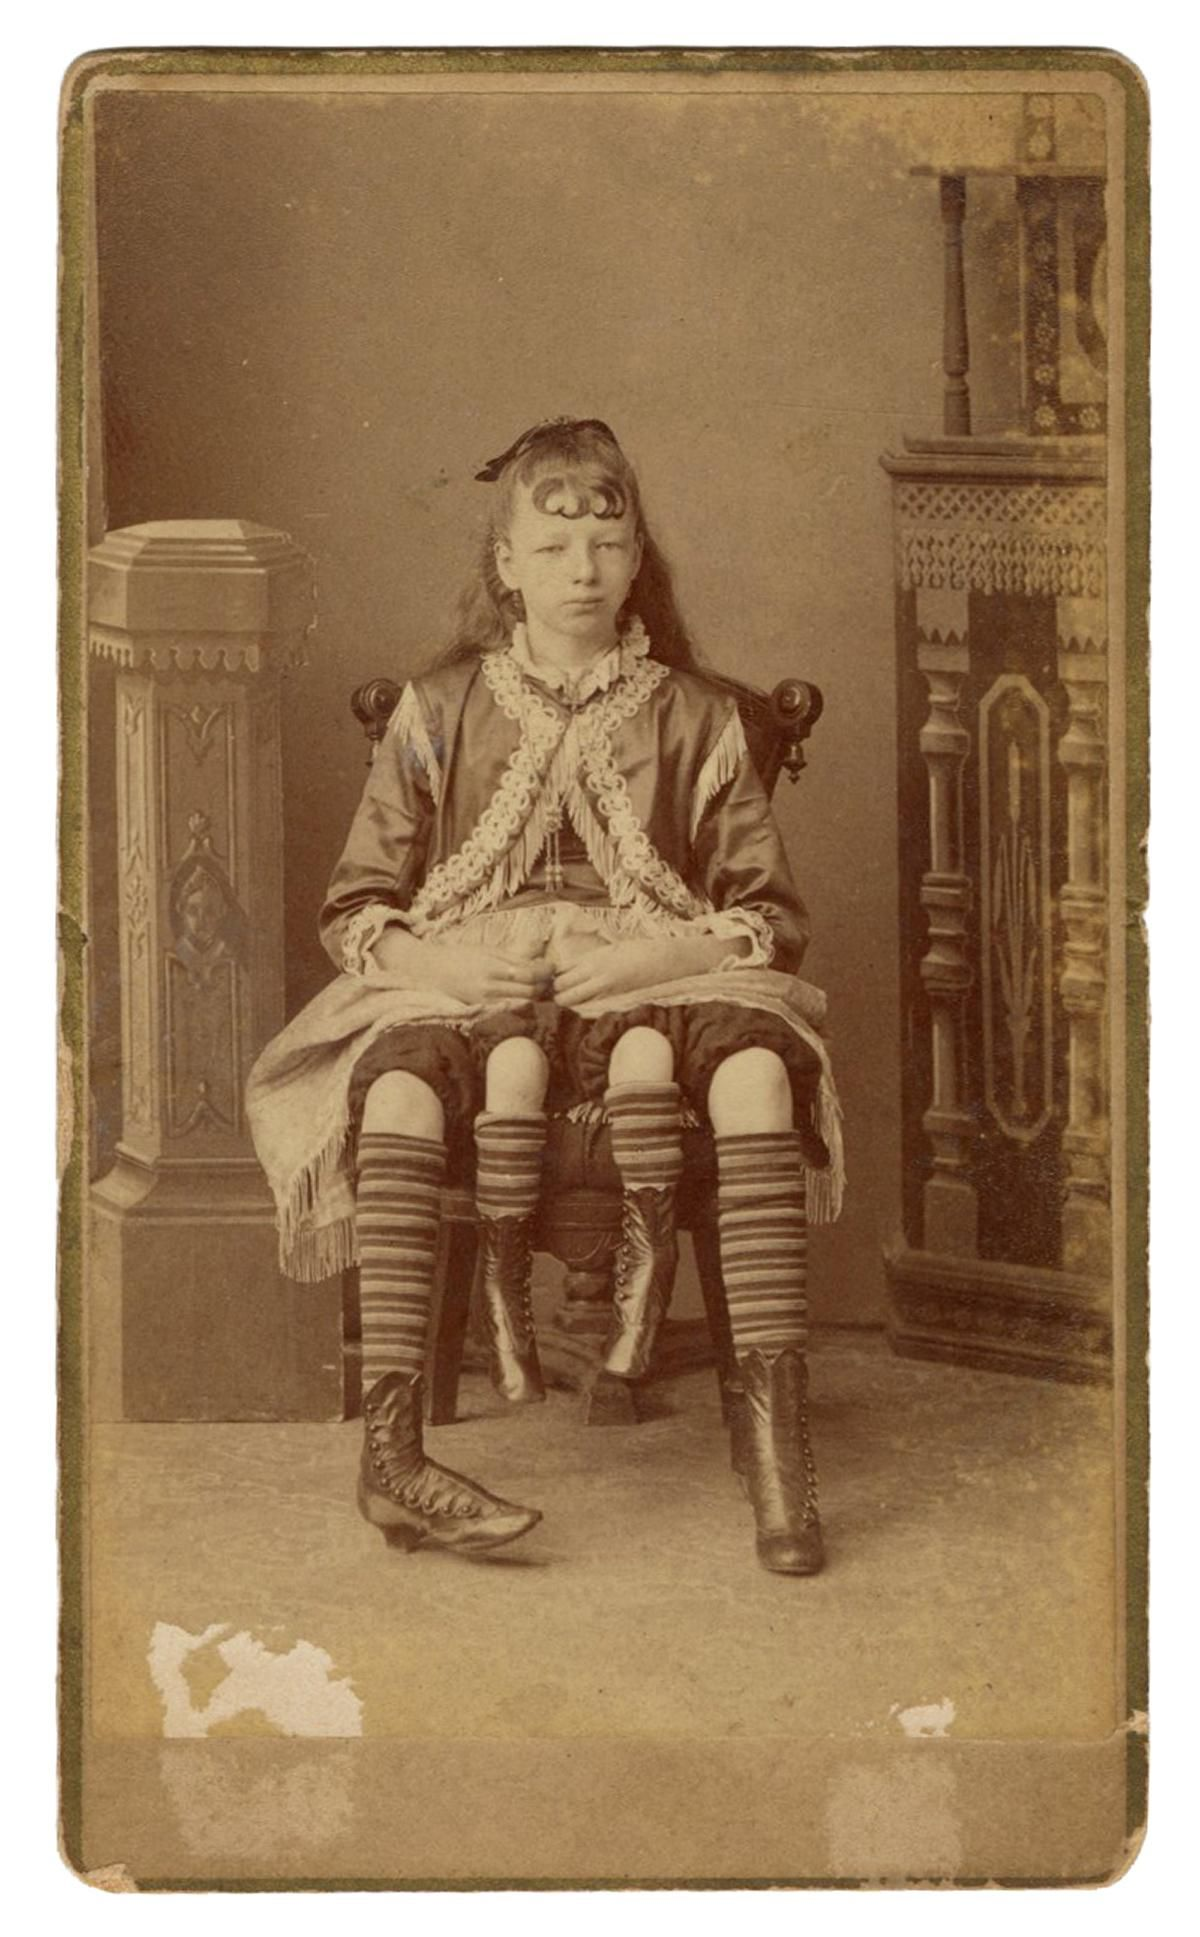 CDV of Myrtle Corbin, Four-Legged Girl. New York: